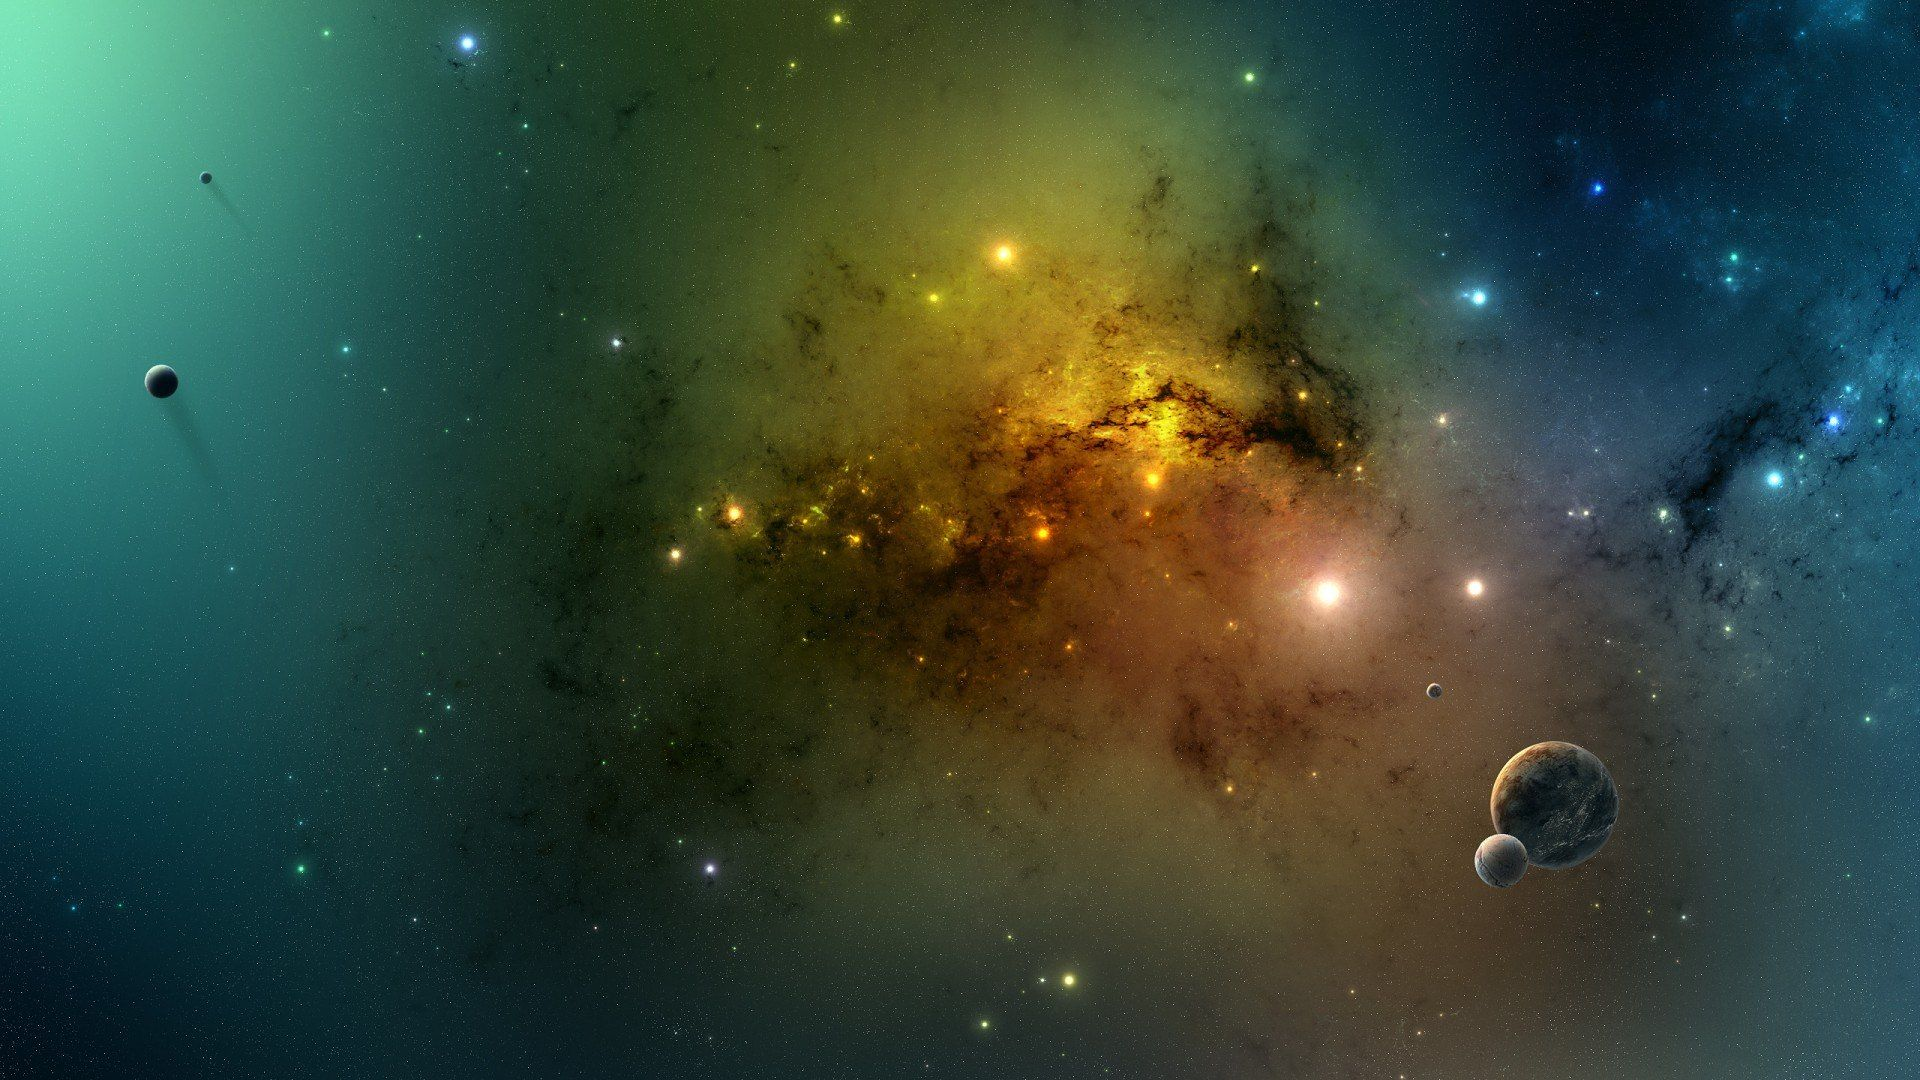 Outer Space desktop wallpaper download